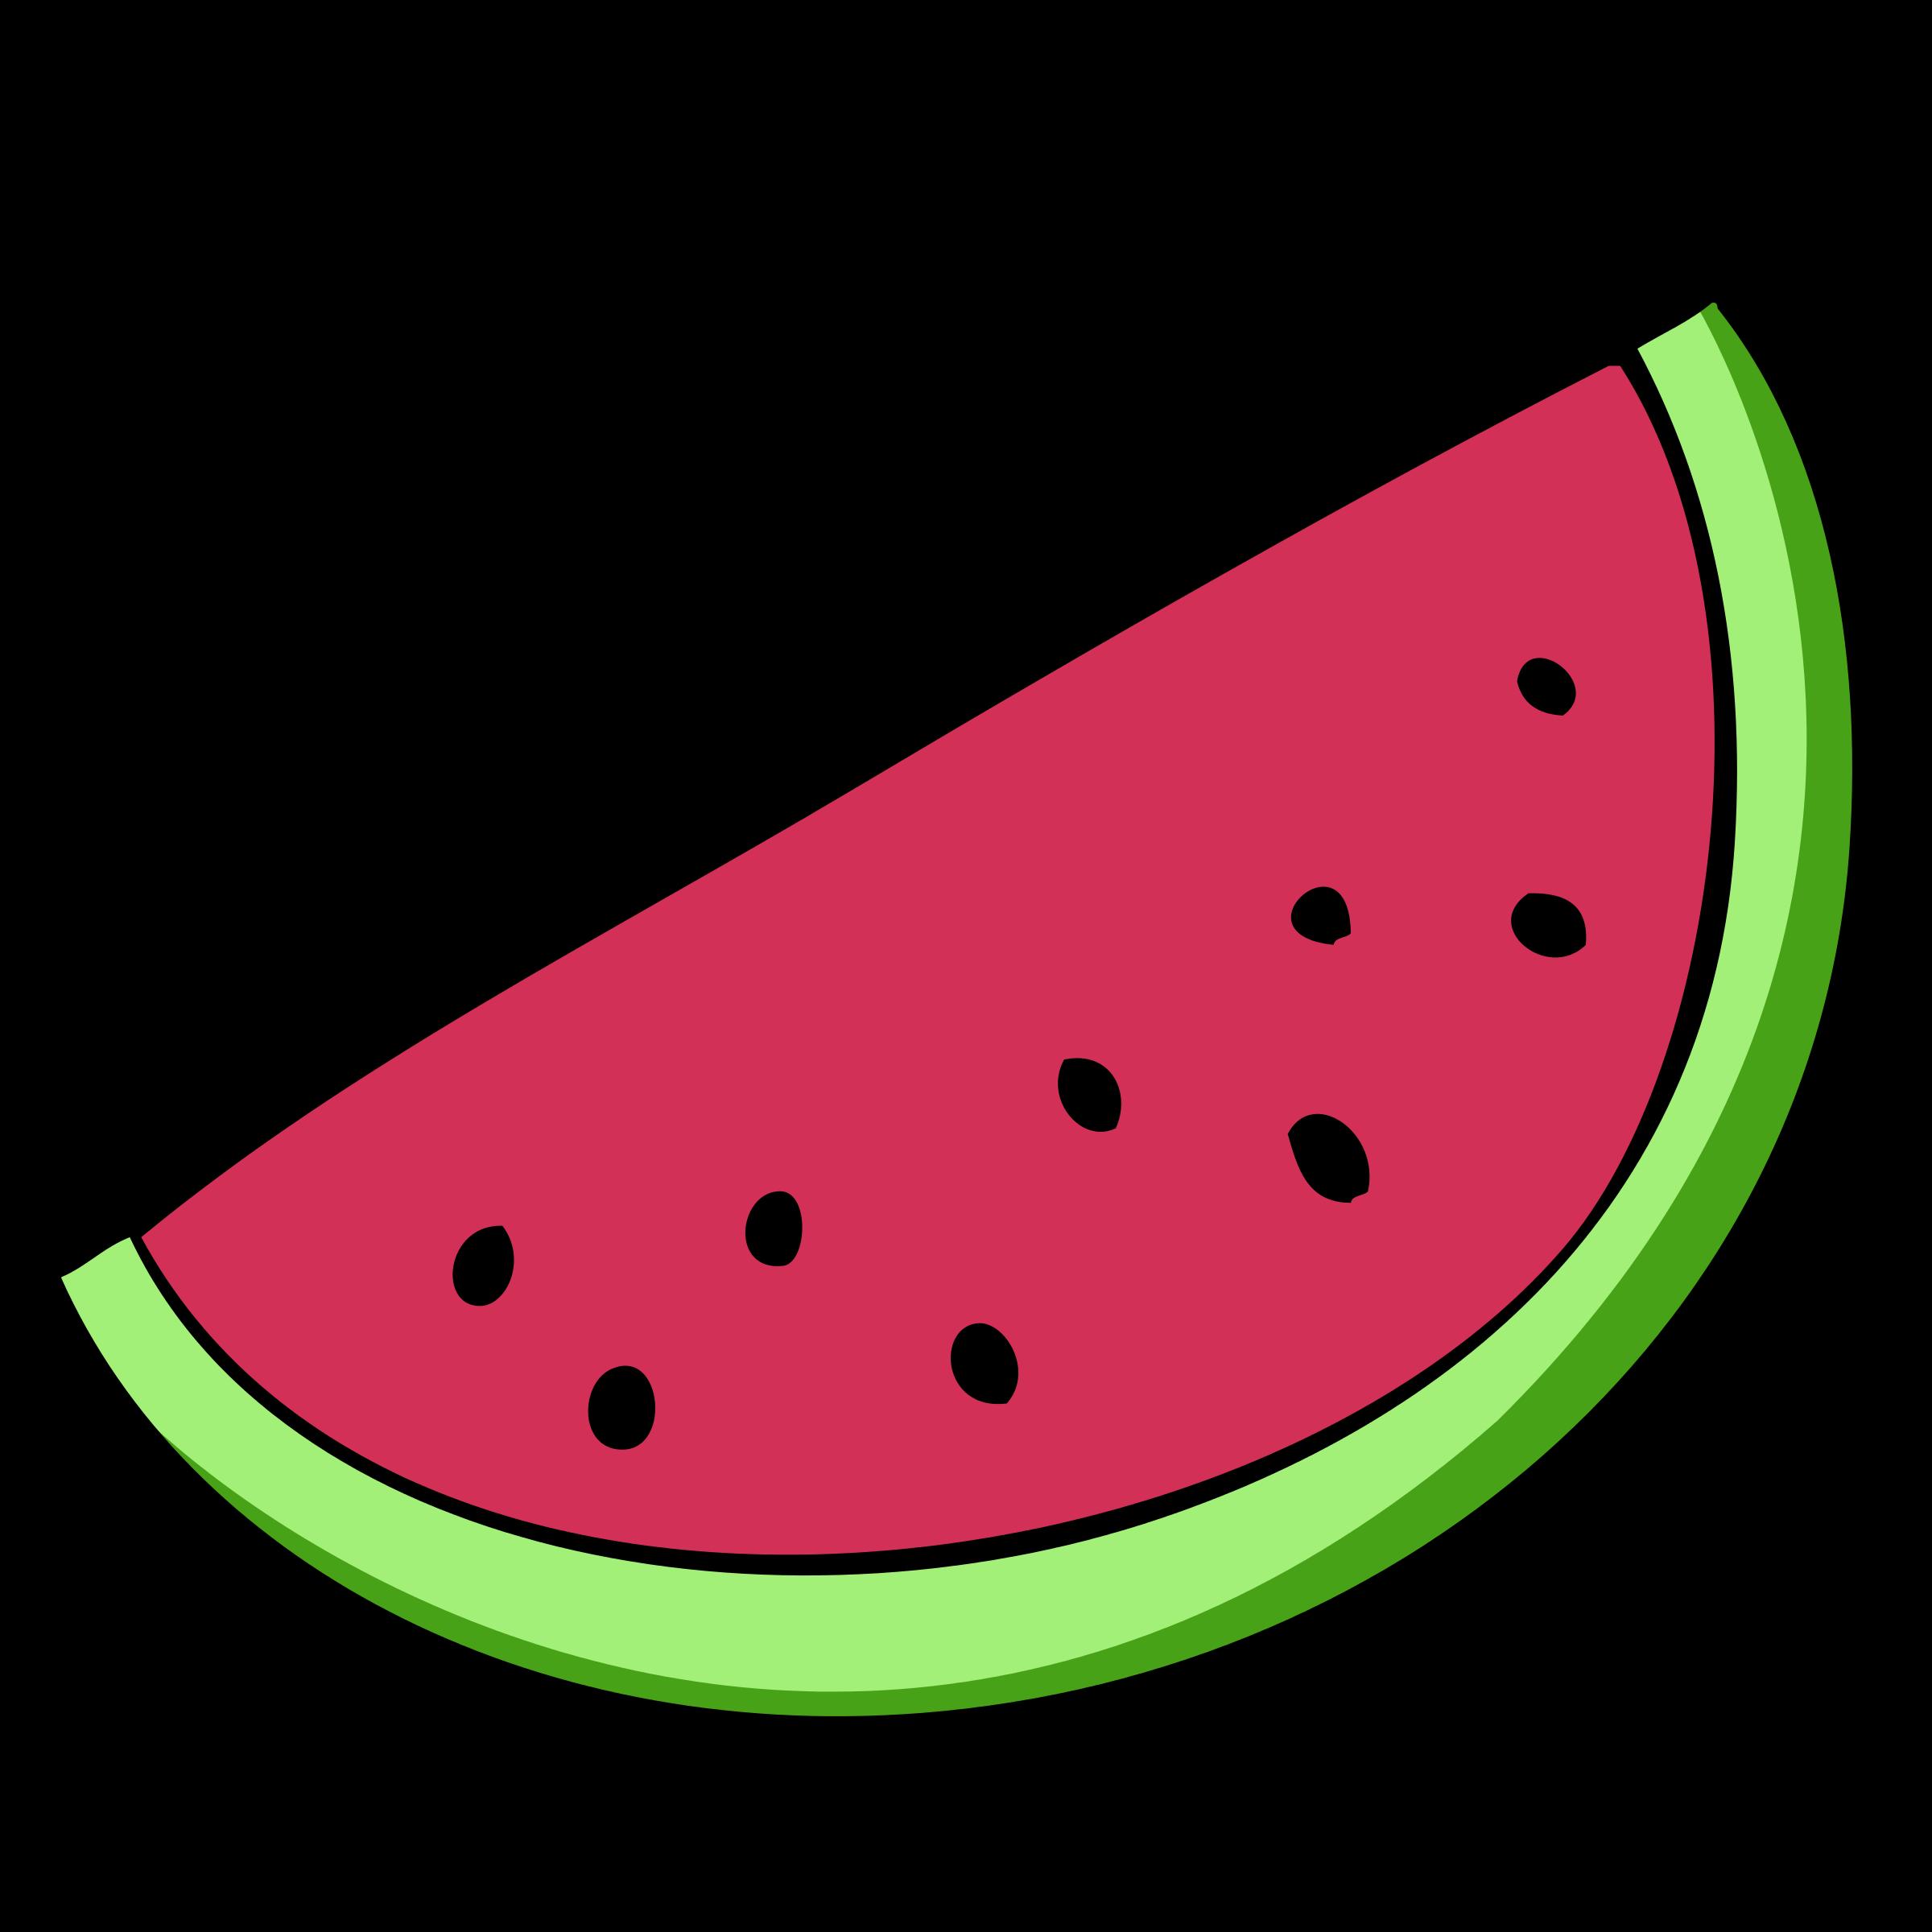 clipart watermelon clipart panda free clipart images rh clipartpanda com watermelon clip art free watermelon clip art public domain